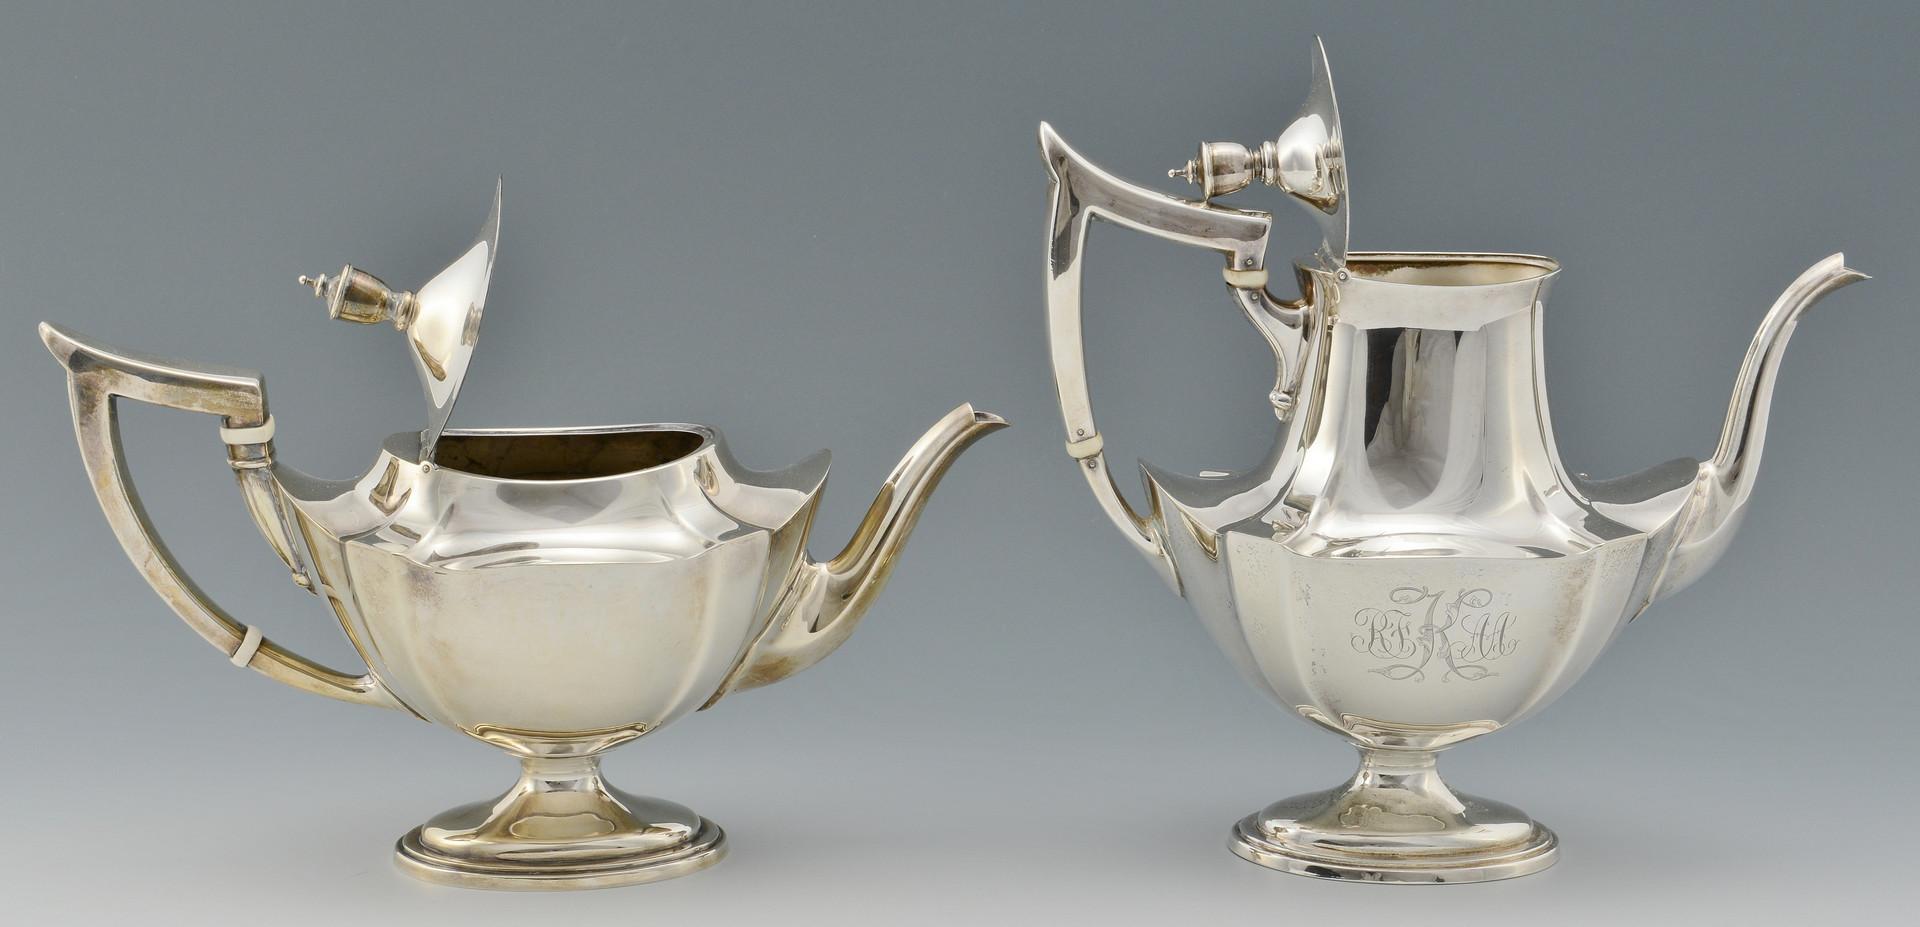 Lot 275: 5 Piece Gorham Tea Set incl. Tray